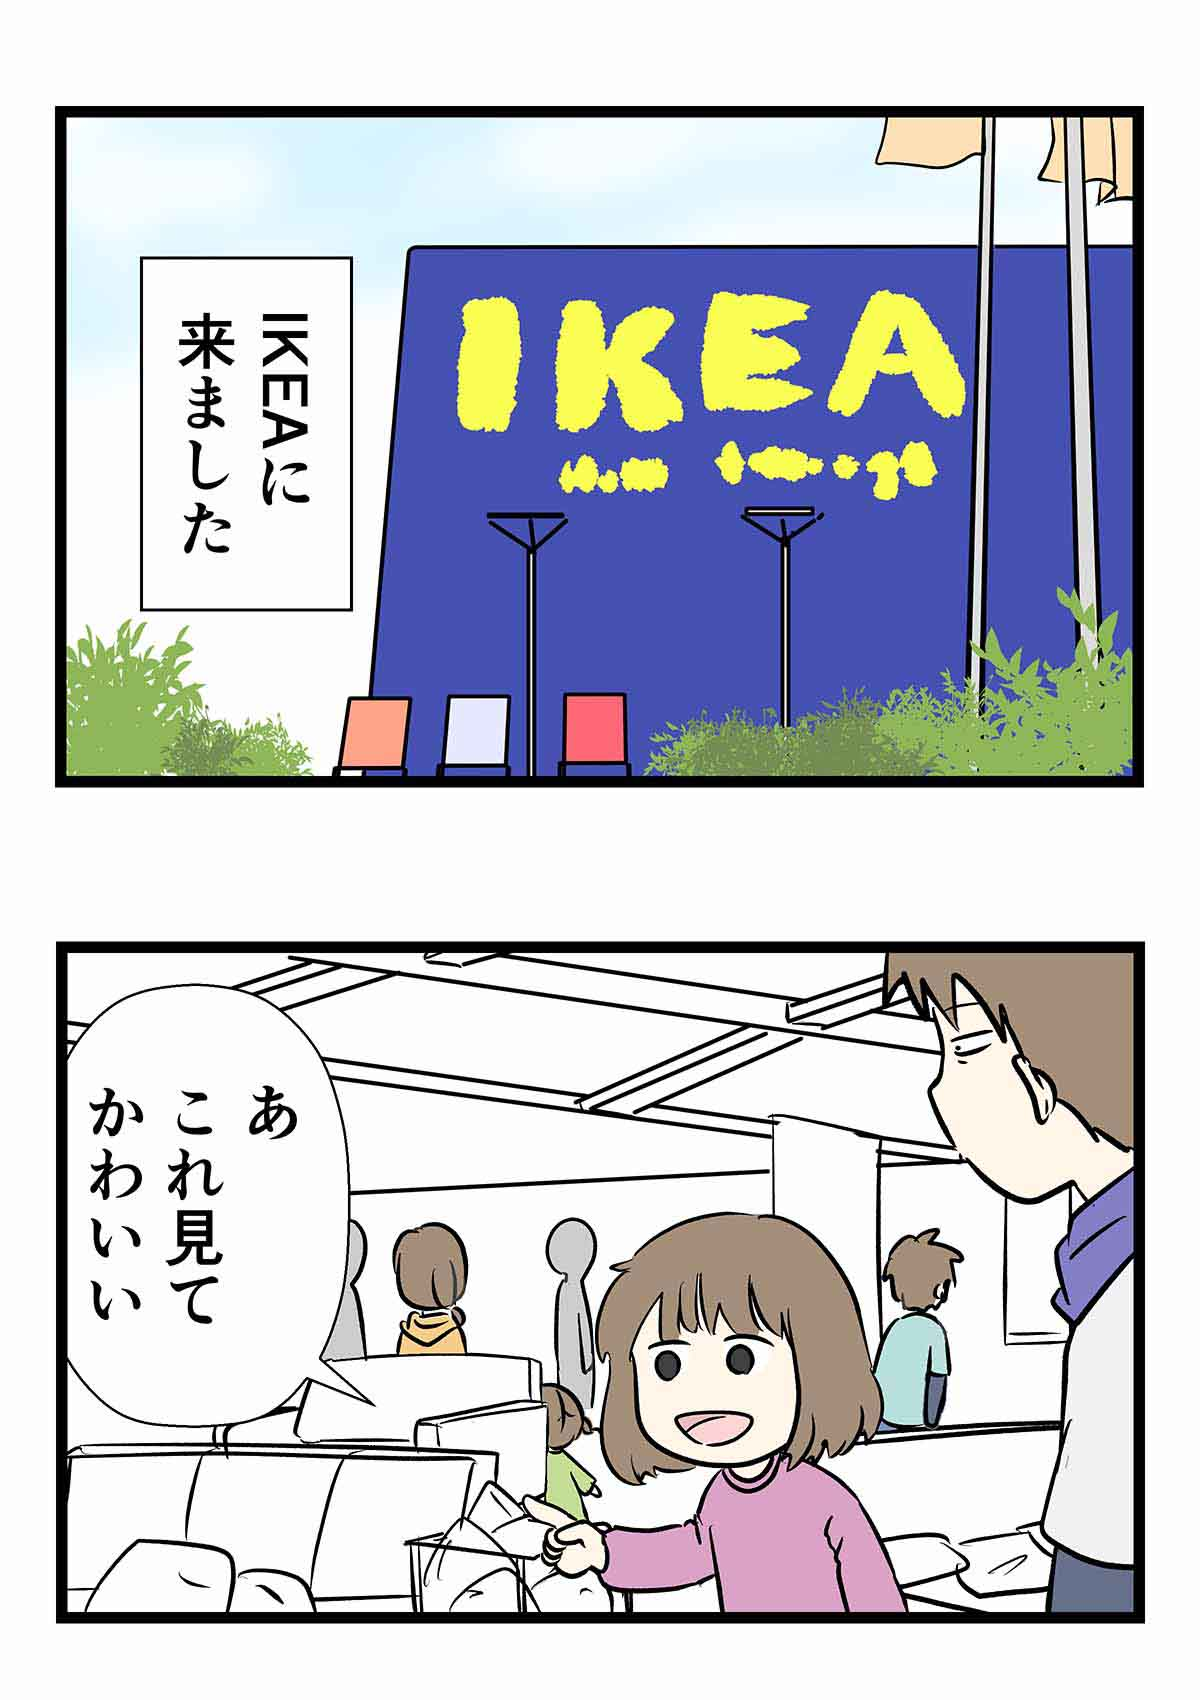 IKEAの電球一つでオシャレに部屋を演出しようとした結果をご覧下さい